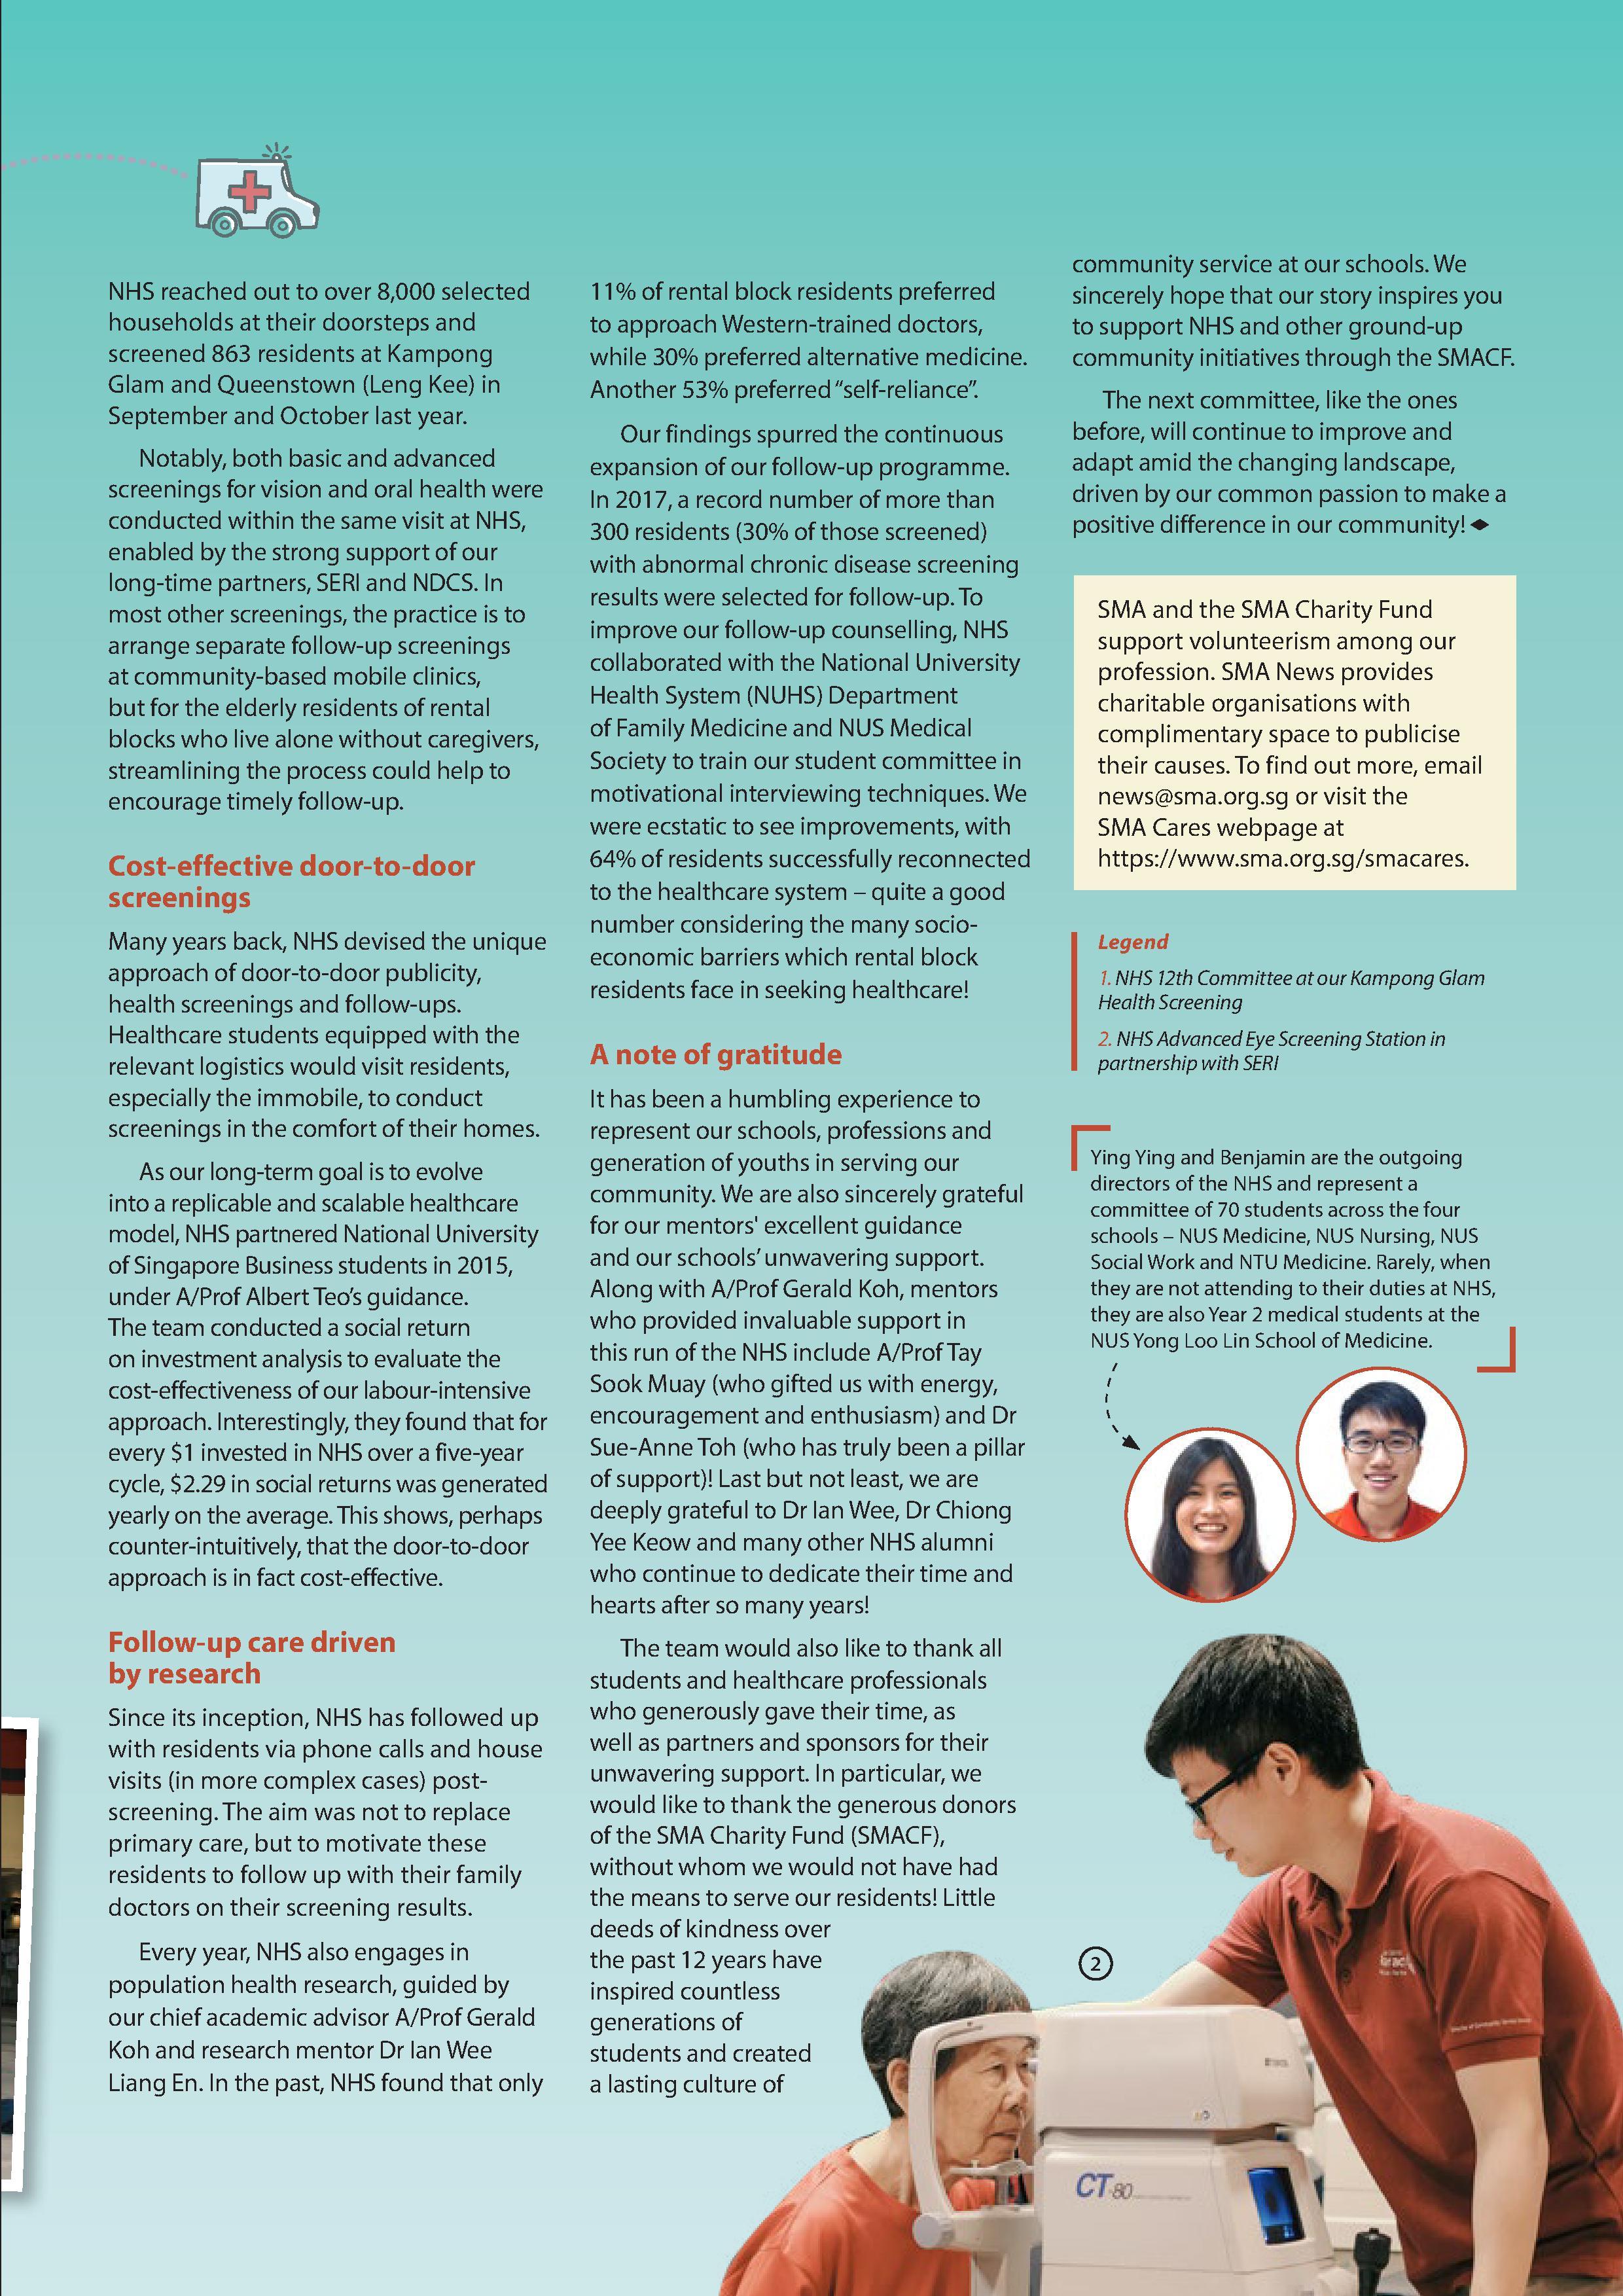 Singapore Medical Association newsletter FEBRUARY 2019